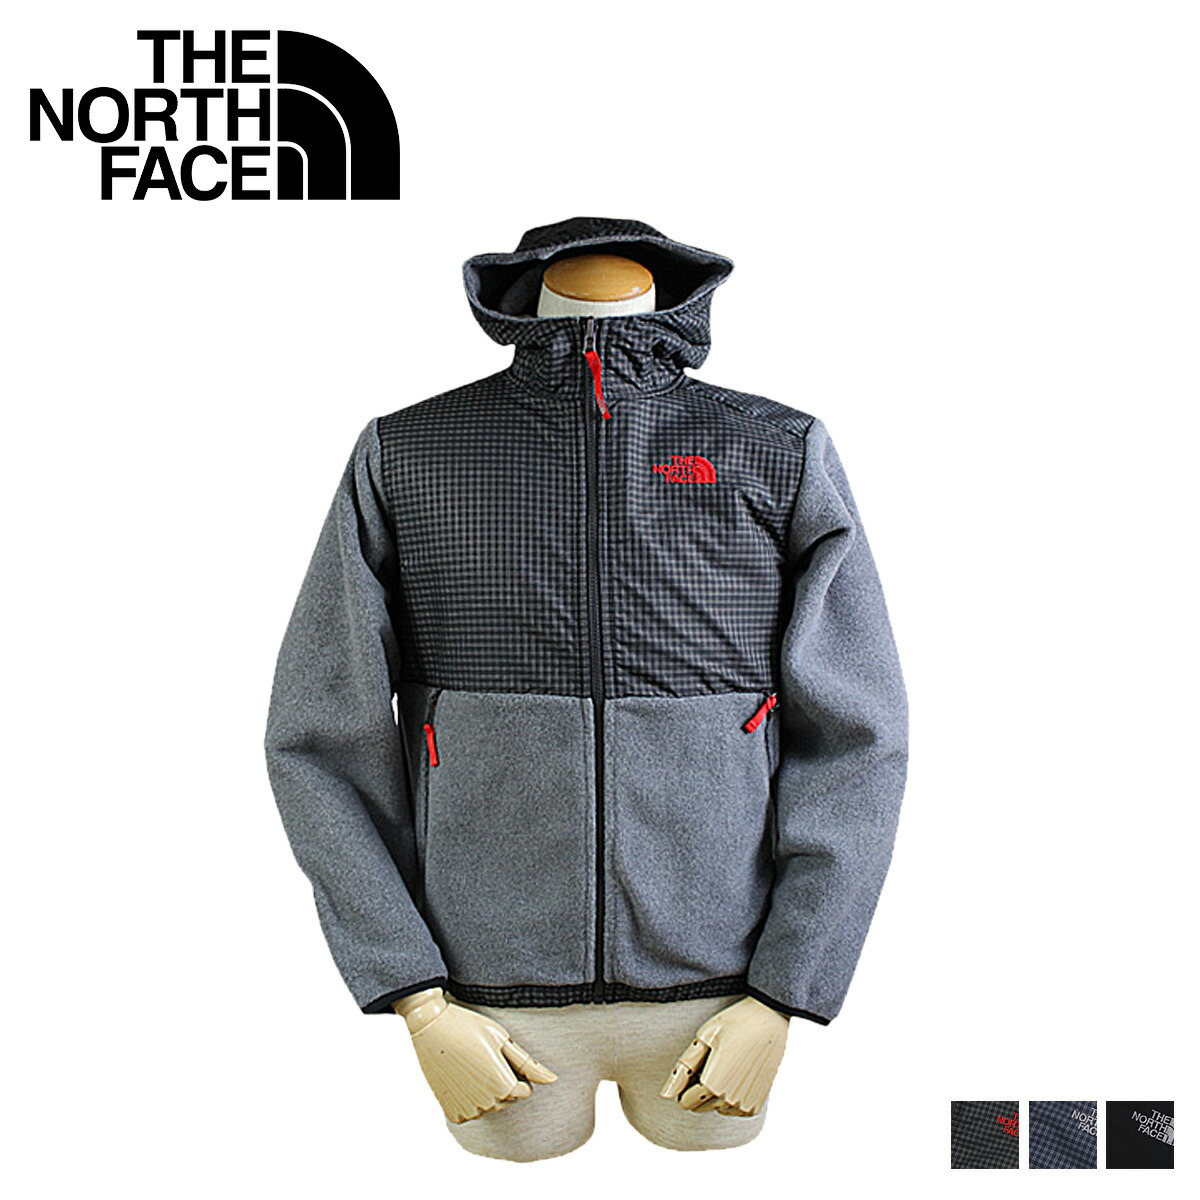 Wholesale North Face Mens Denali Hoodie - En Store Sugarltd Item Nf01 1401 Aqgc  S Id 3dborderless Recommend Item En